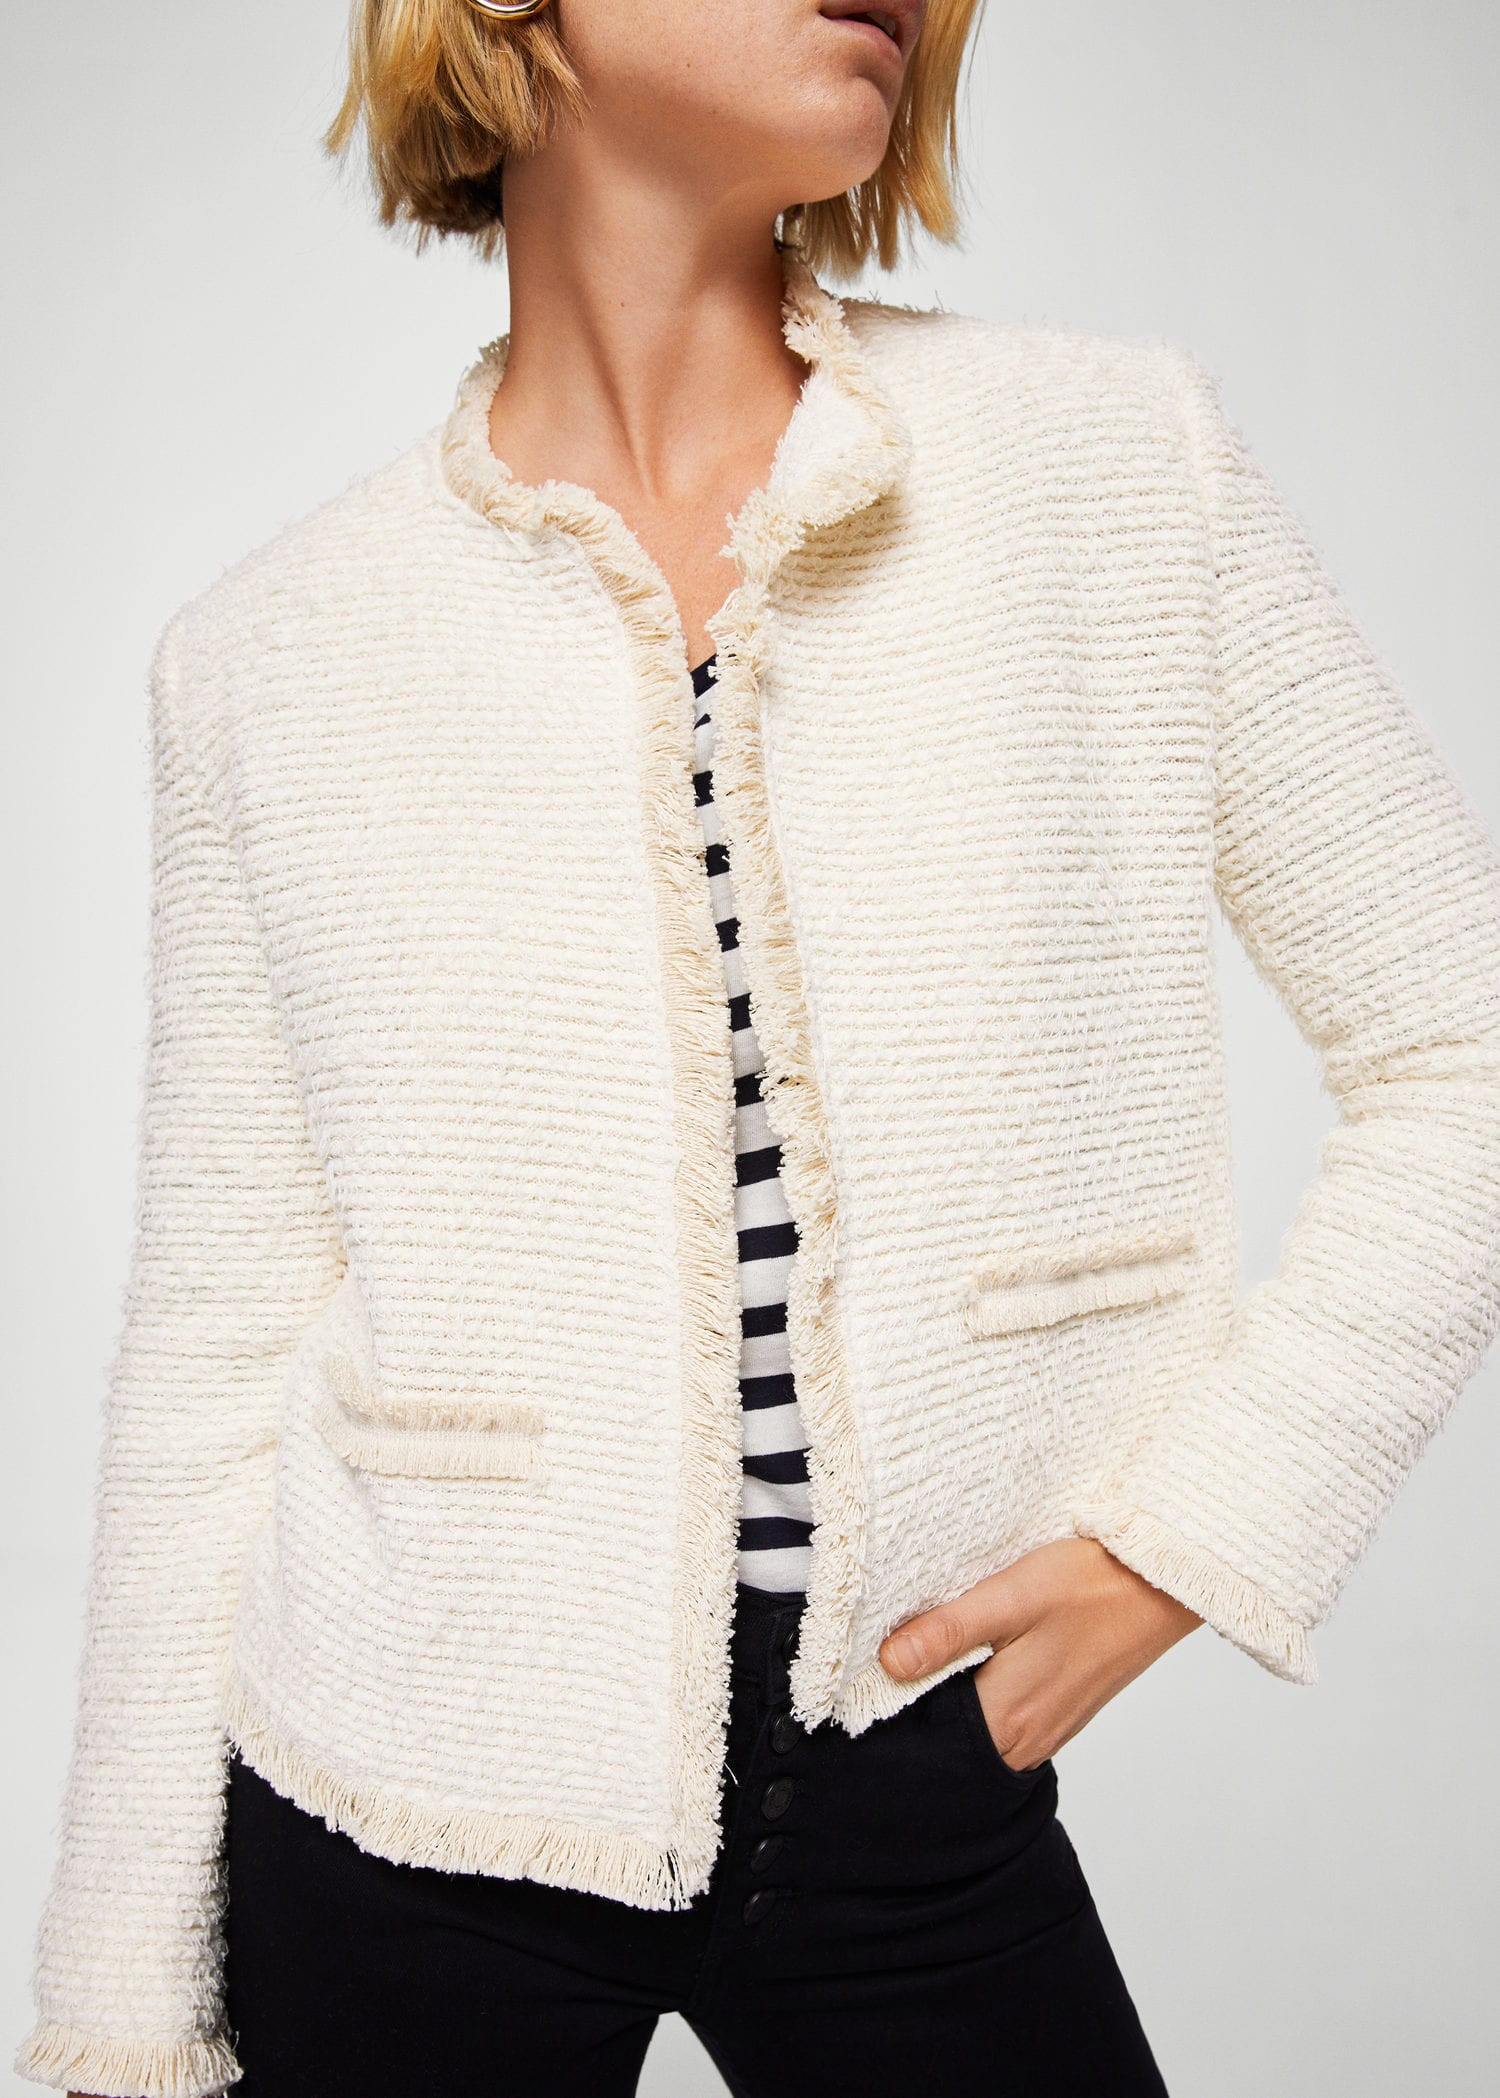 Mango Trim Tweed Jacket - Women   XXS   Products in 2018   Pinterest ... 8145ef0f1c72